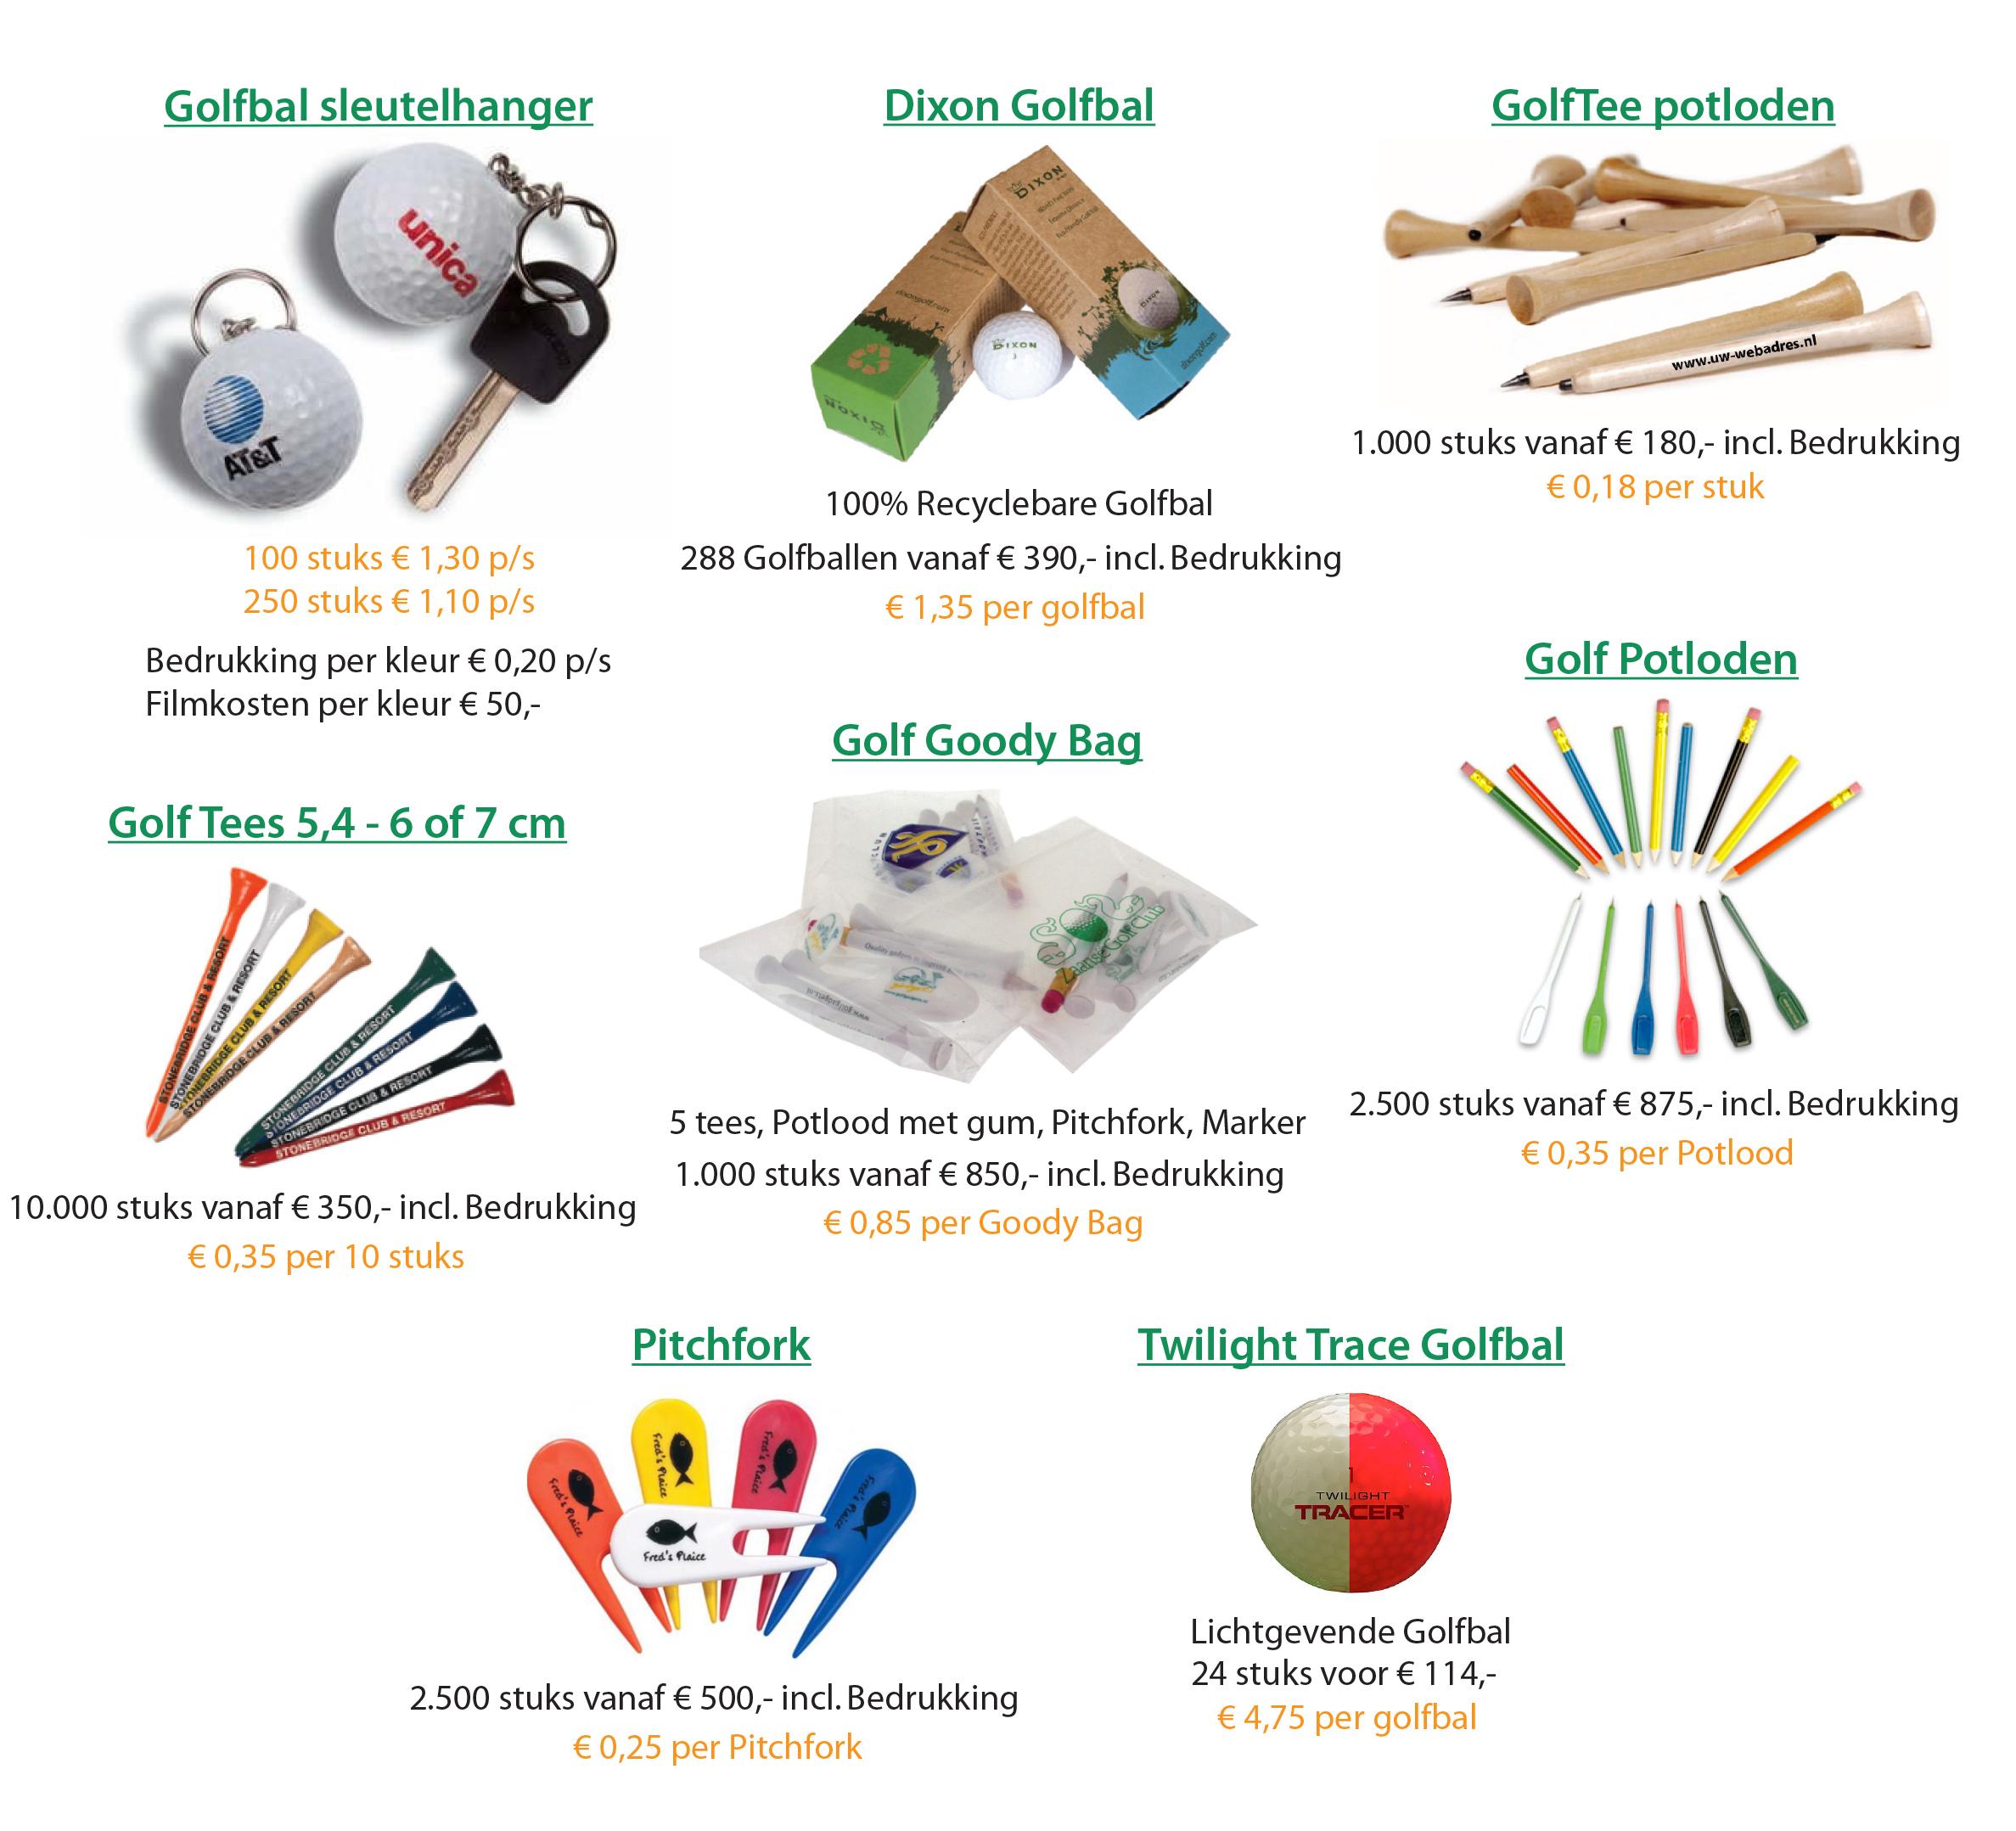 Golf-Gadgets-Mailing-2014